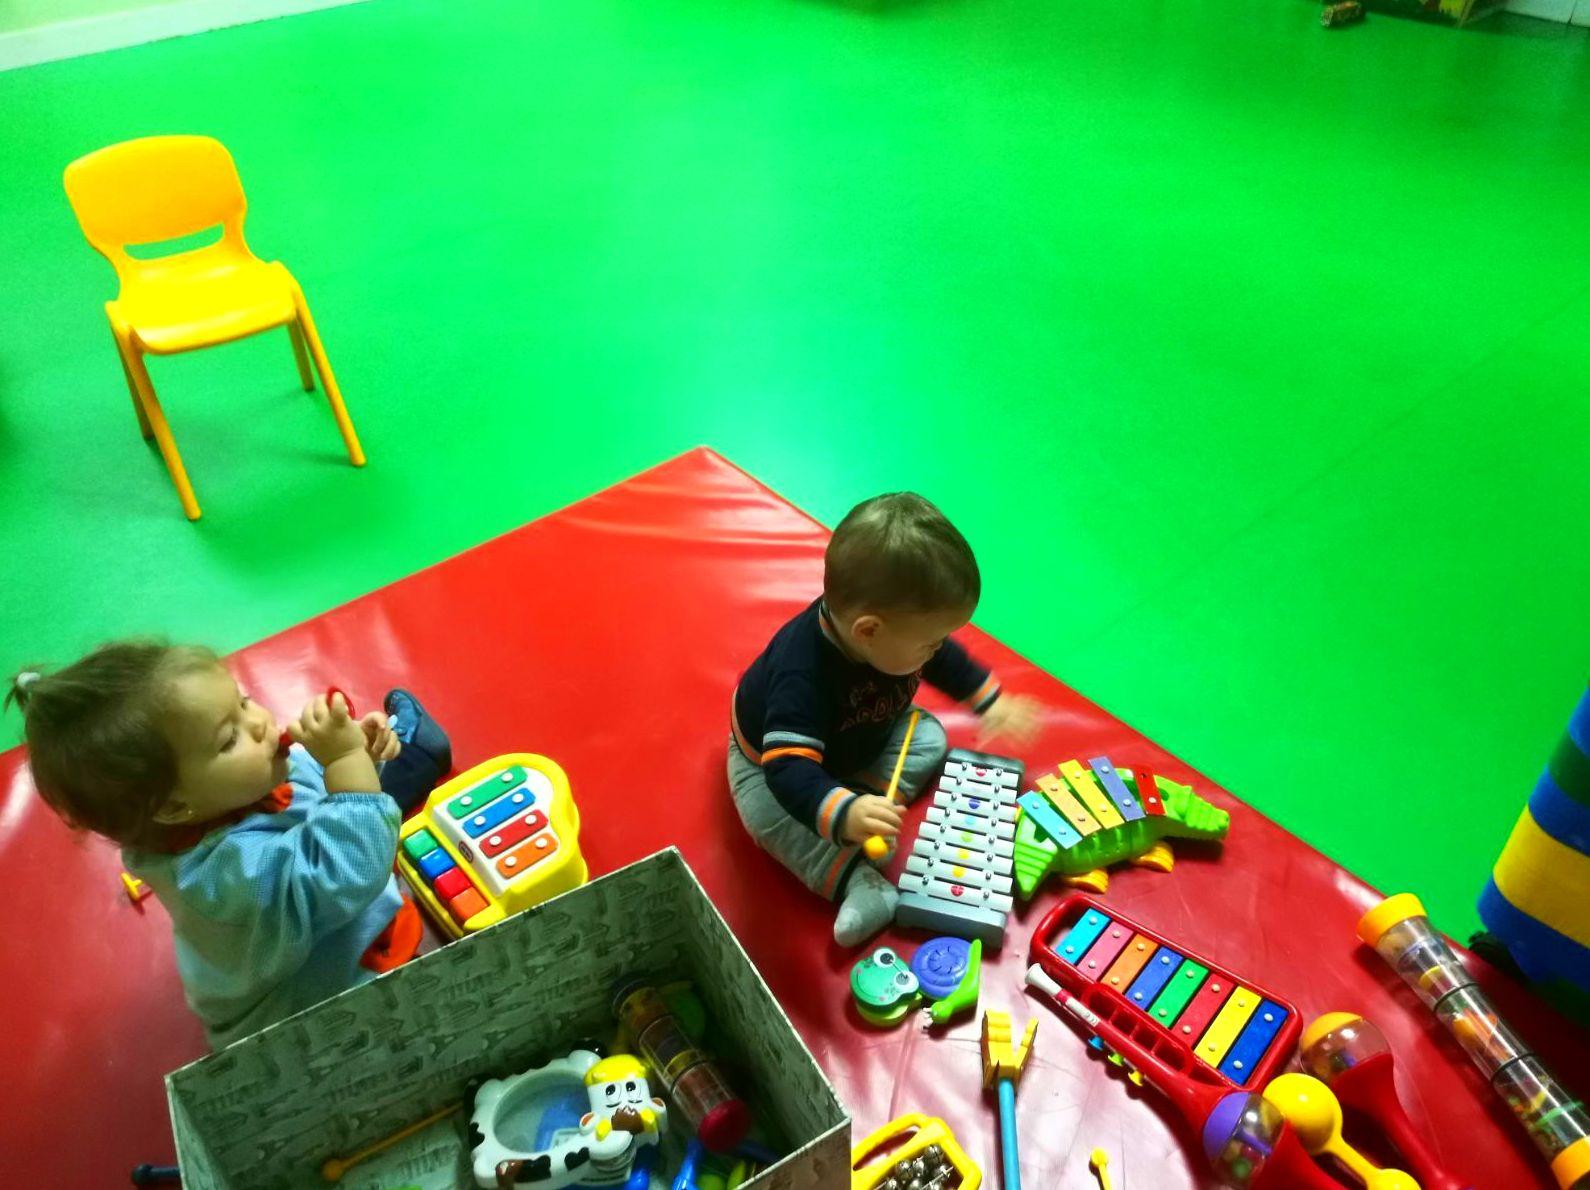 Foto 16 de Escuela infantil en Algete | E.I. Cuatro Pecas de Colores